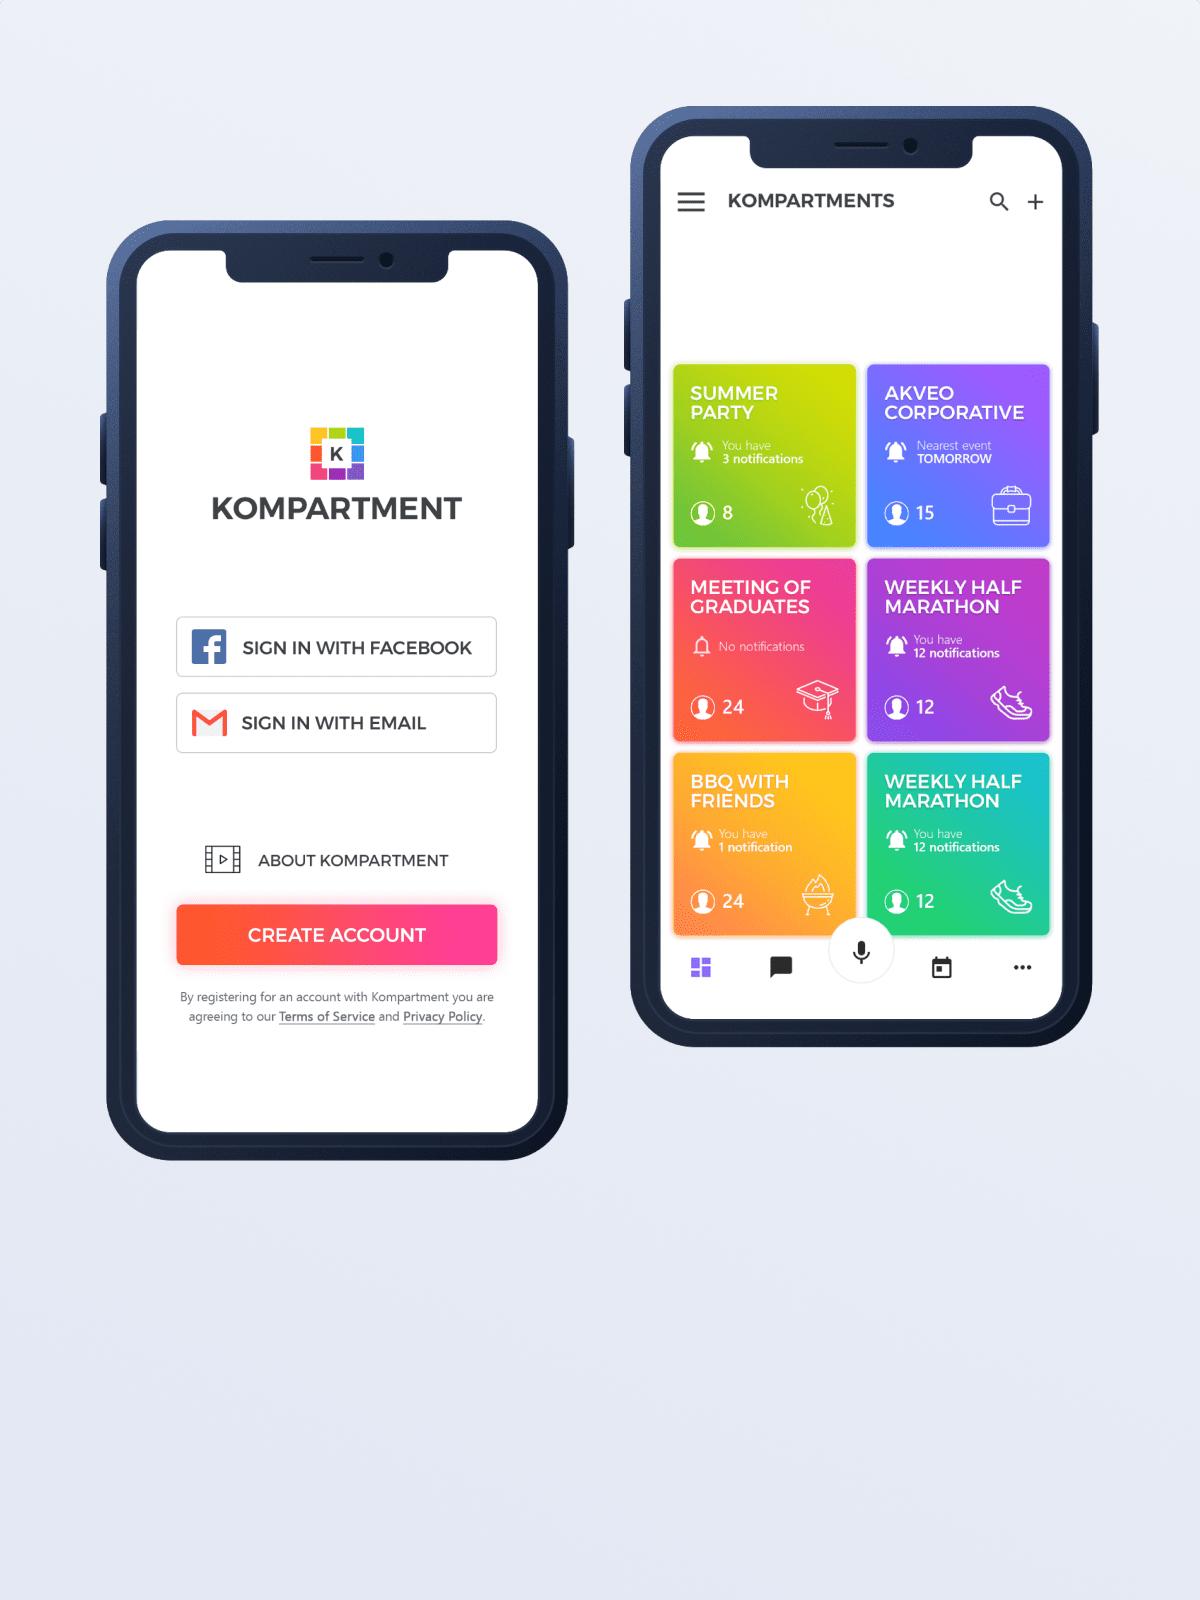 Mobile application development and design